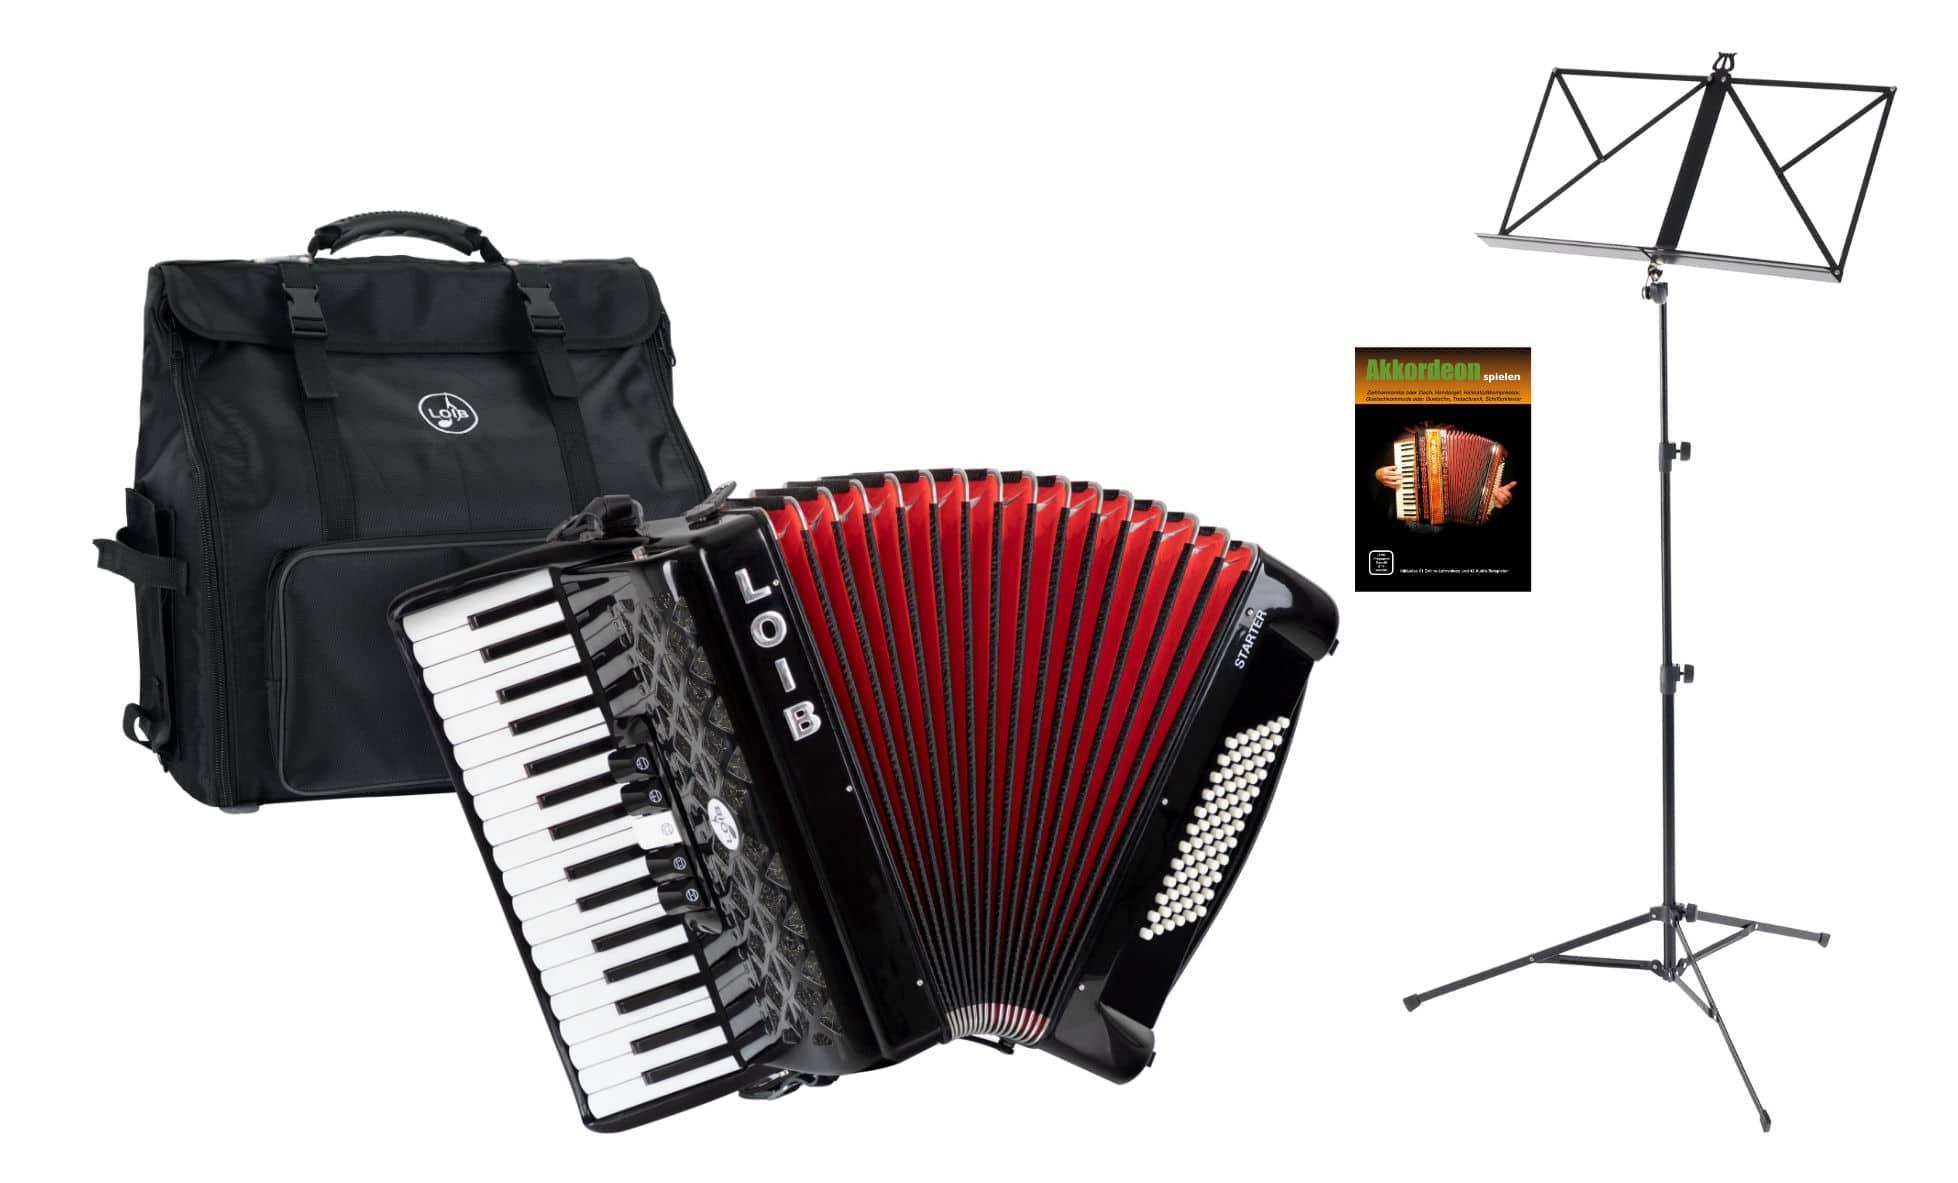 Akkordeons - Loib Starter III 72 BK Einsteiger Akkordeon Set Schwarz - Onlineshop Musikhaus Kirstein